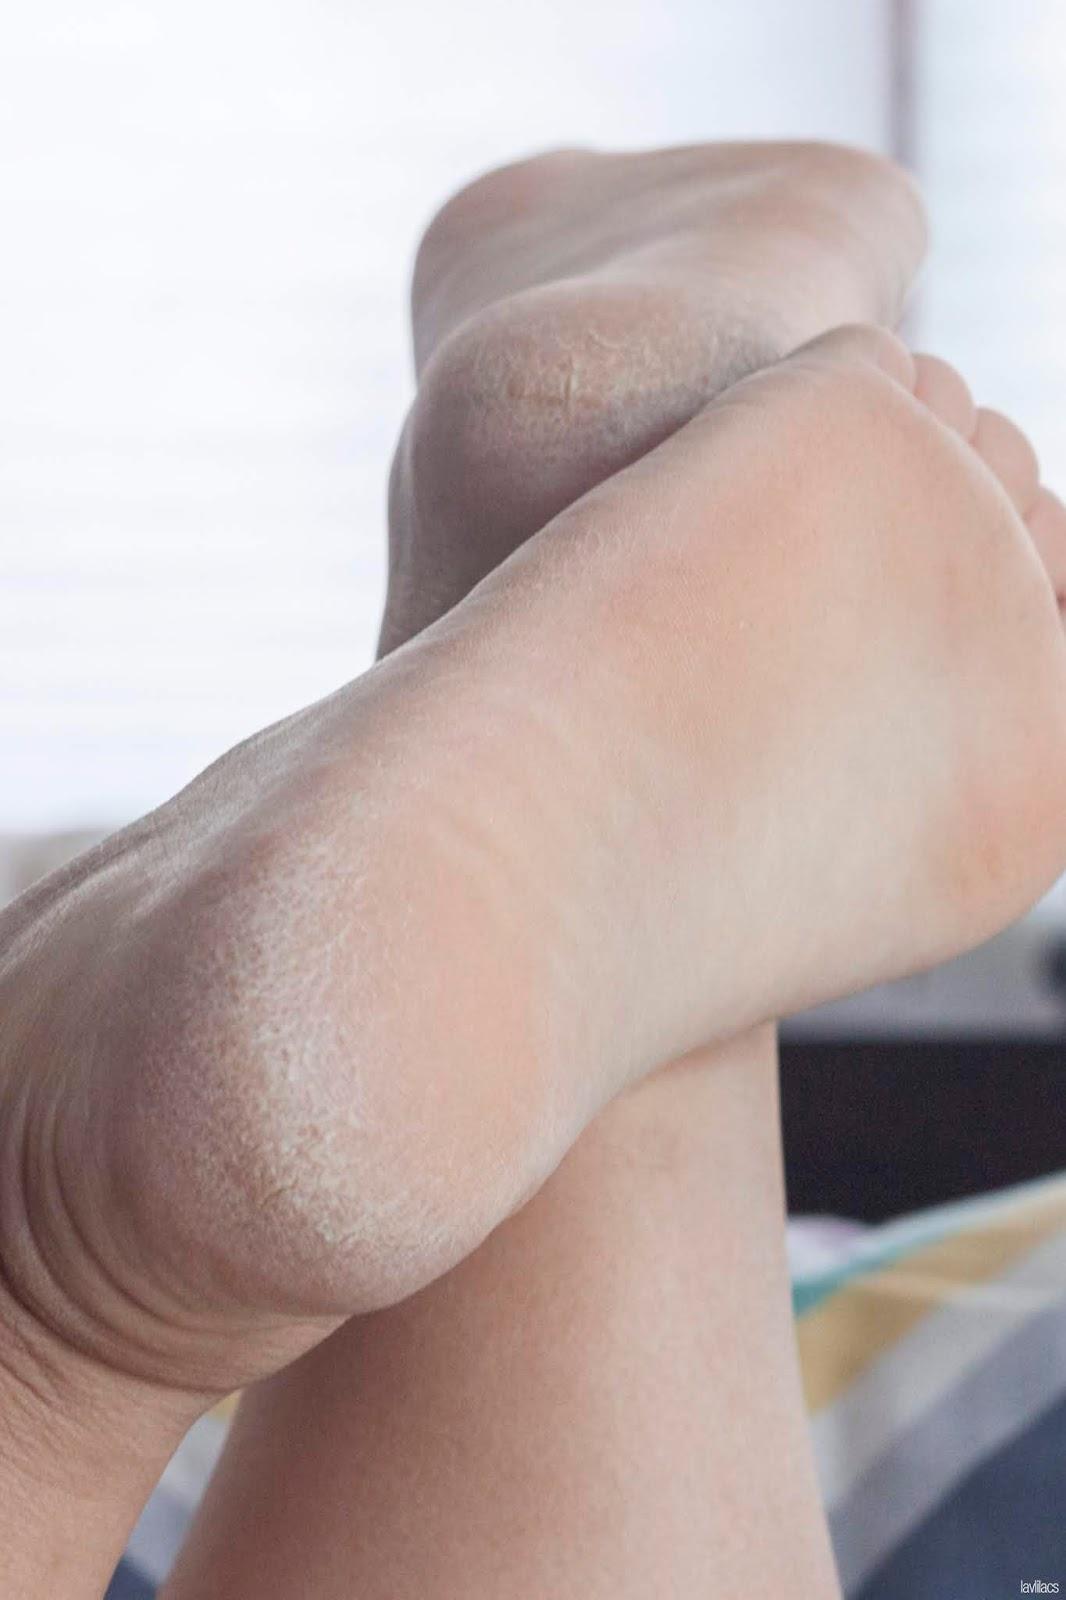 The Face Shop Smile Foot Peeling Before Closeup